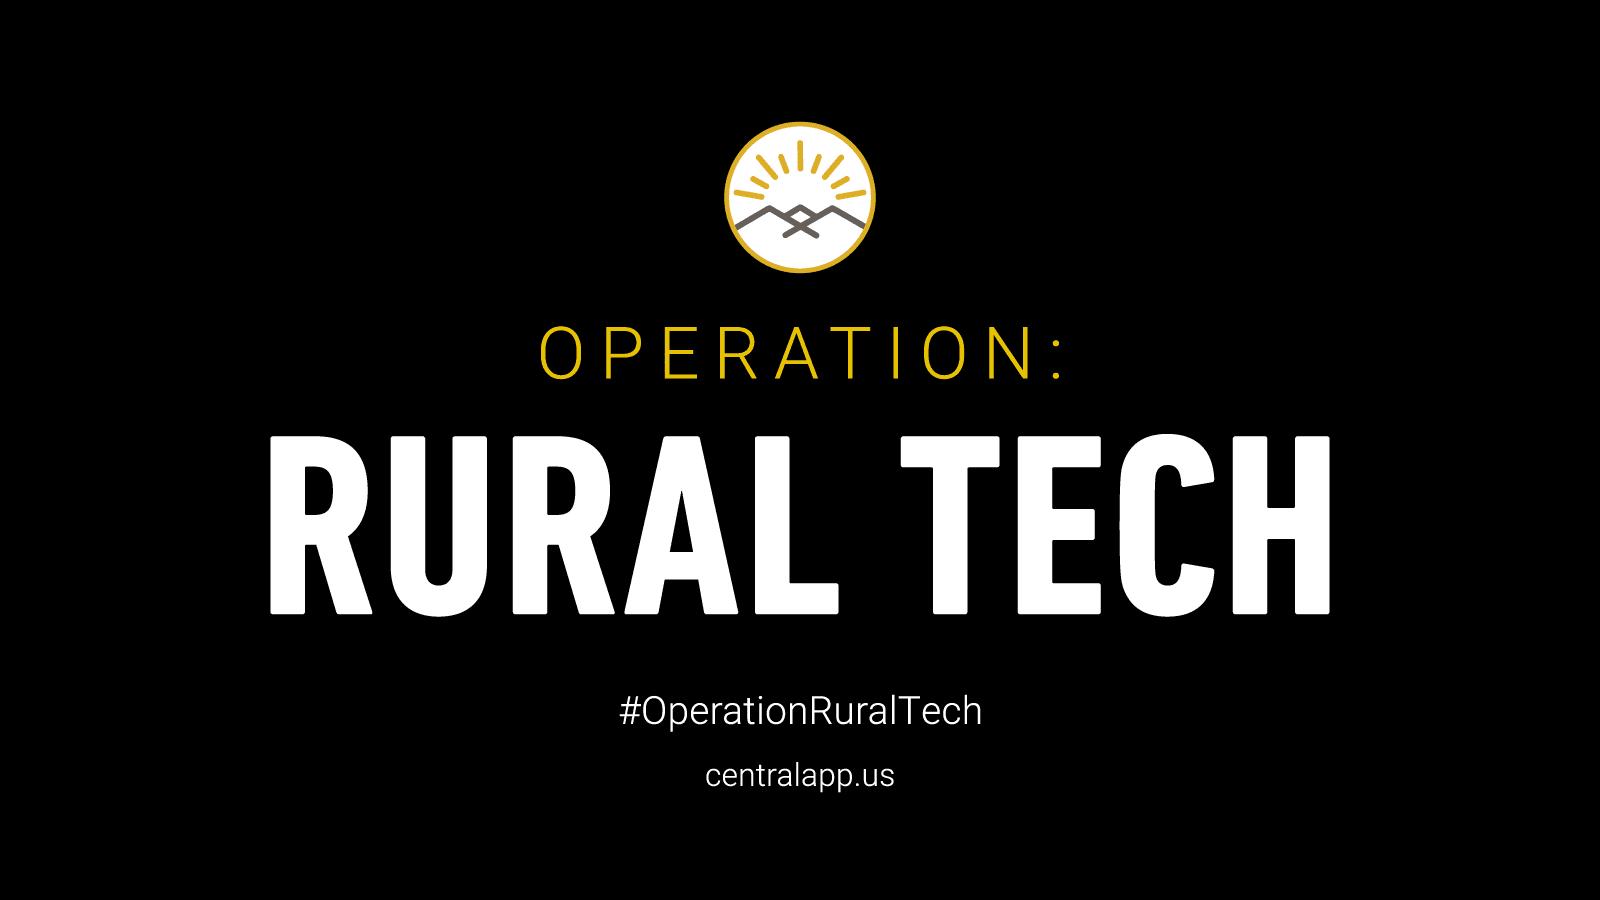 Operation-Rural-Tech-1600x900-1